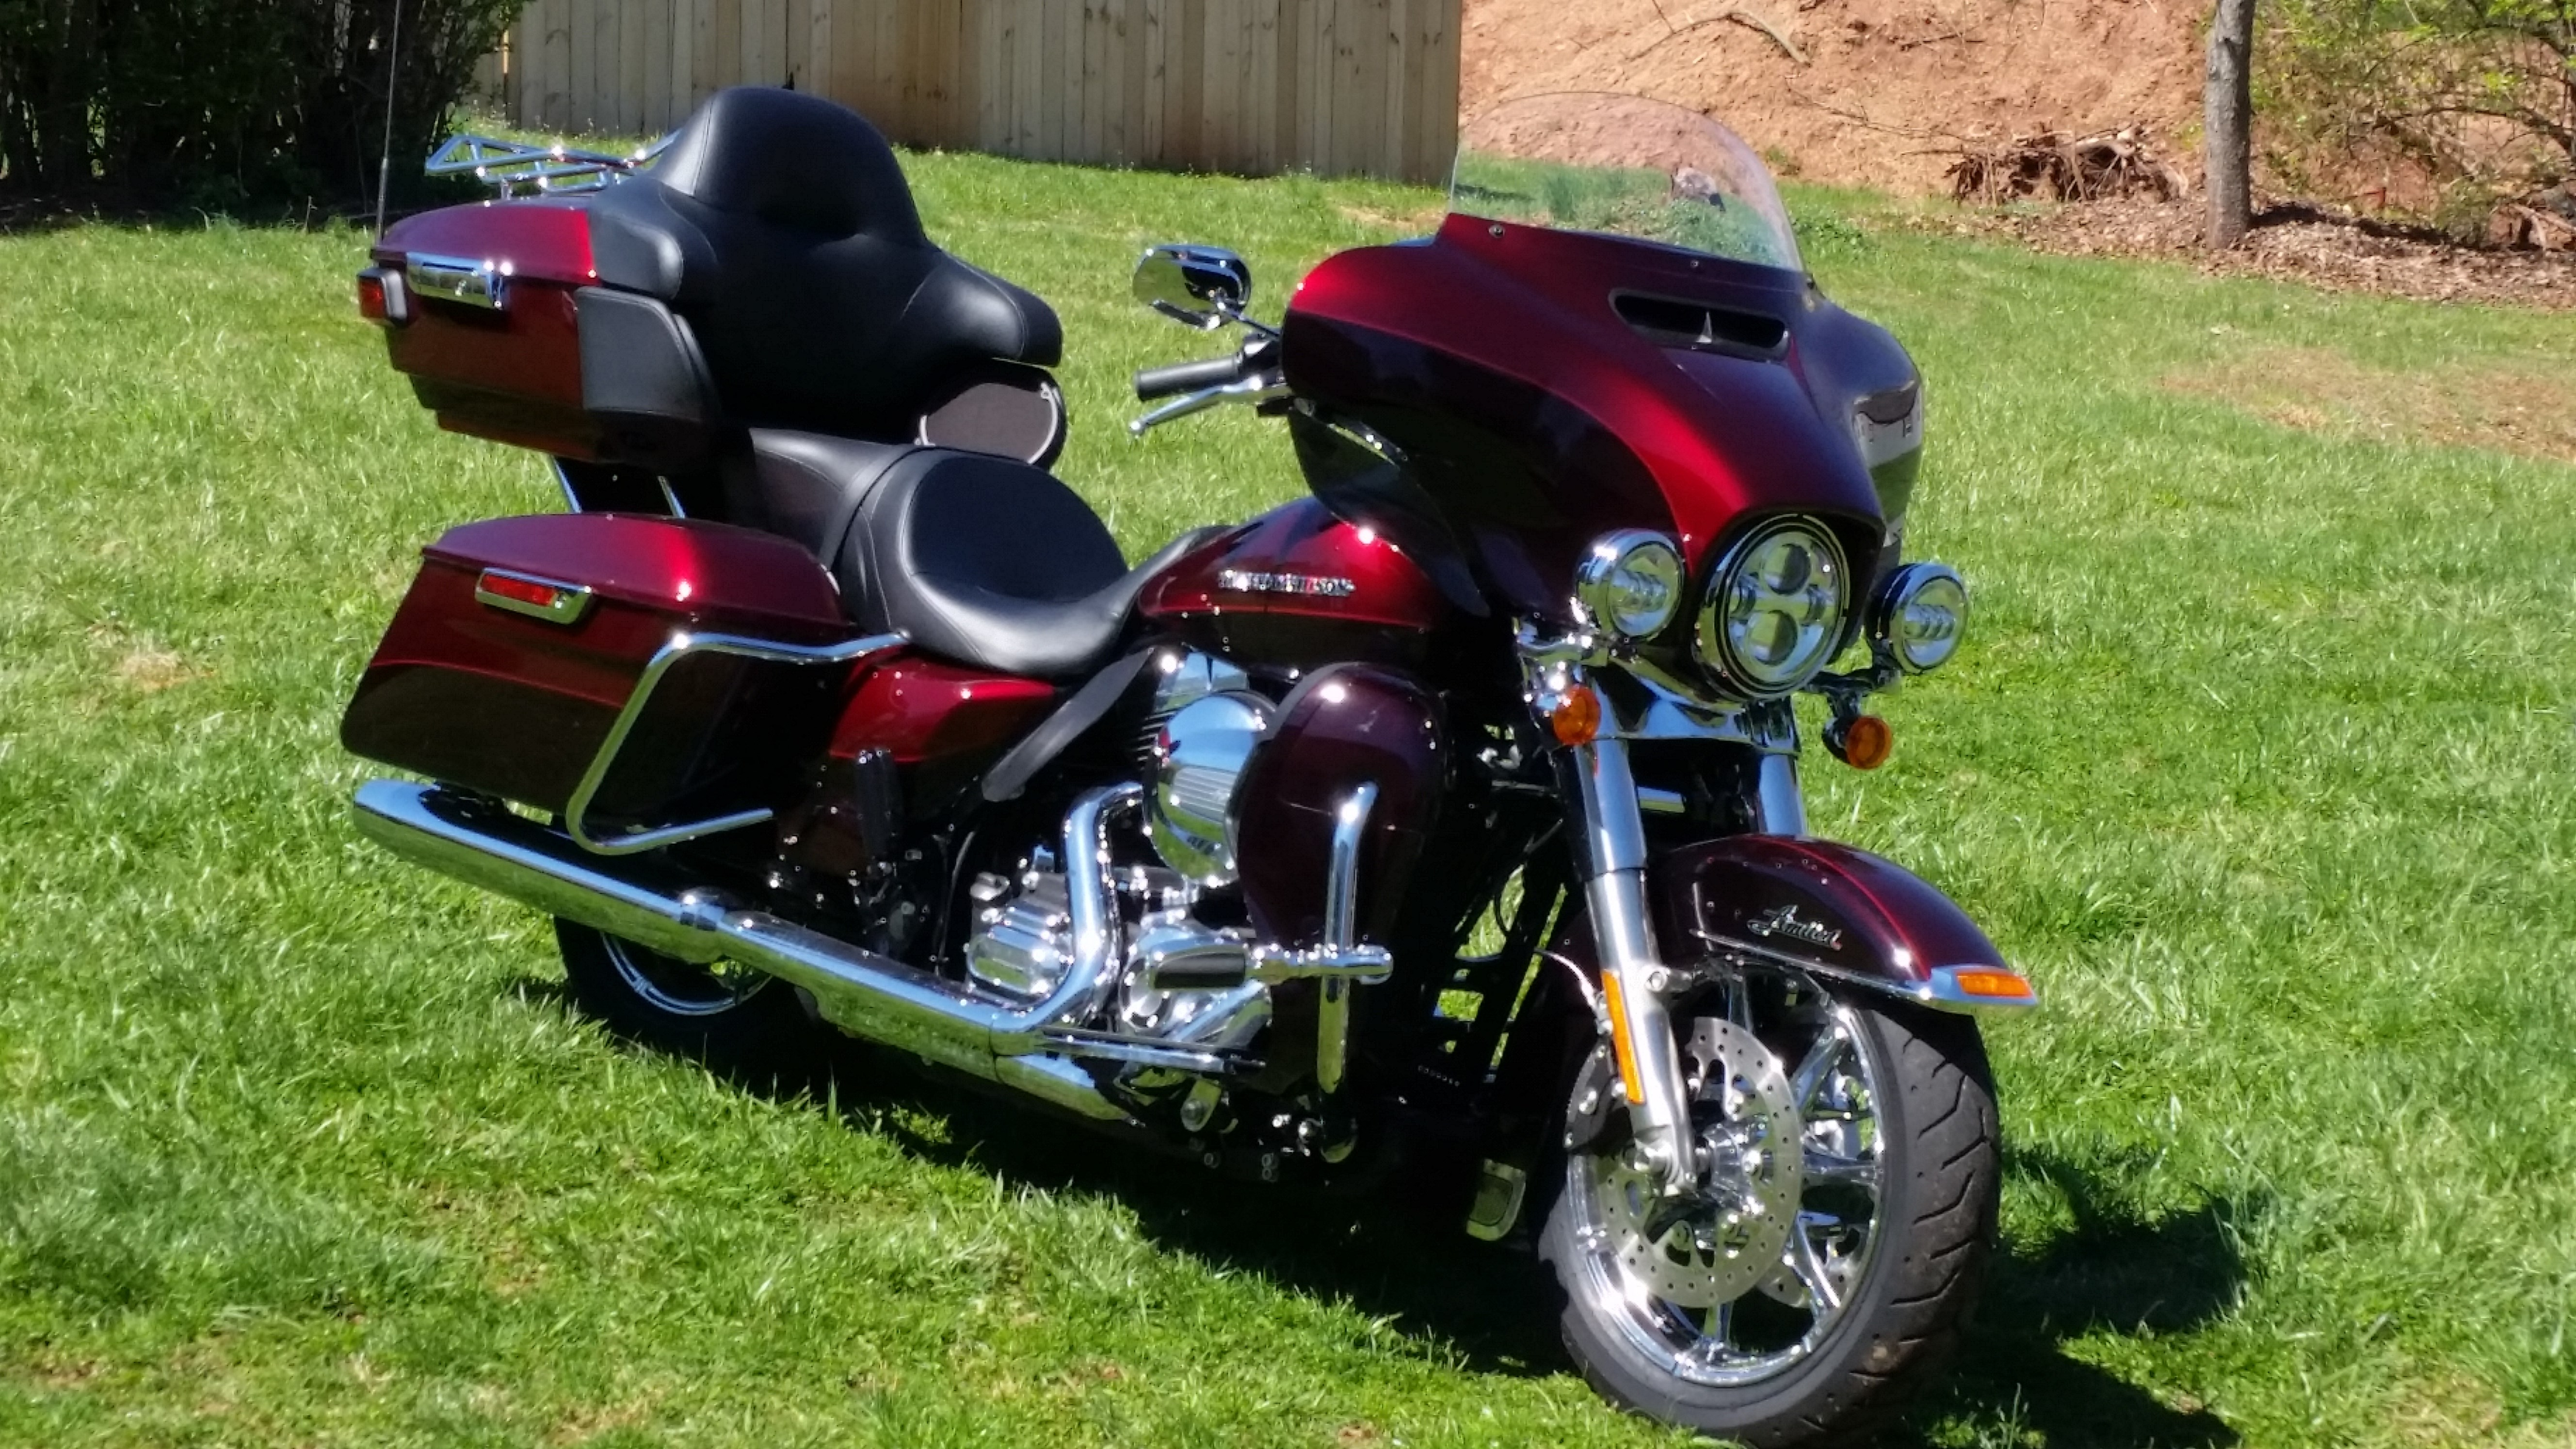 Used Harley Davidson Under